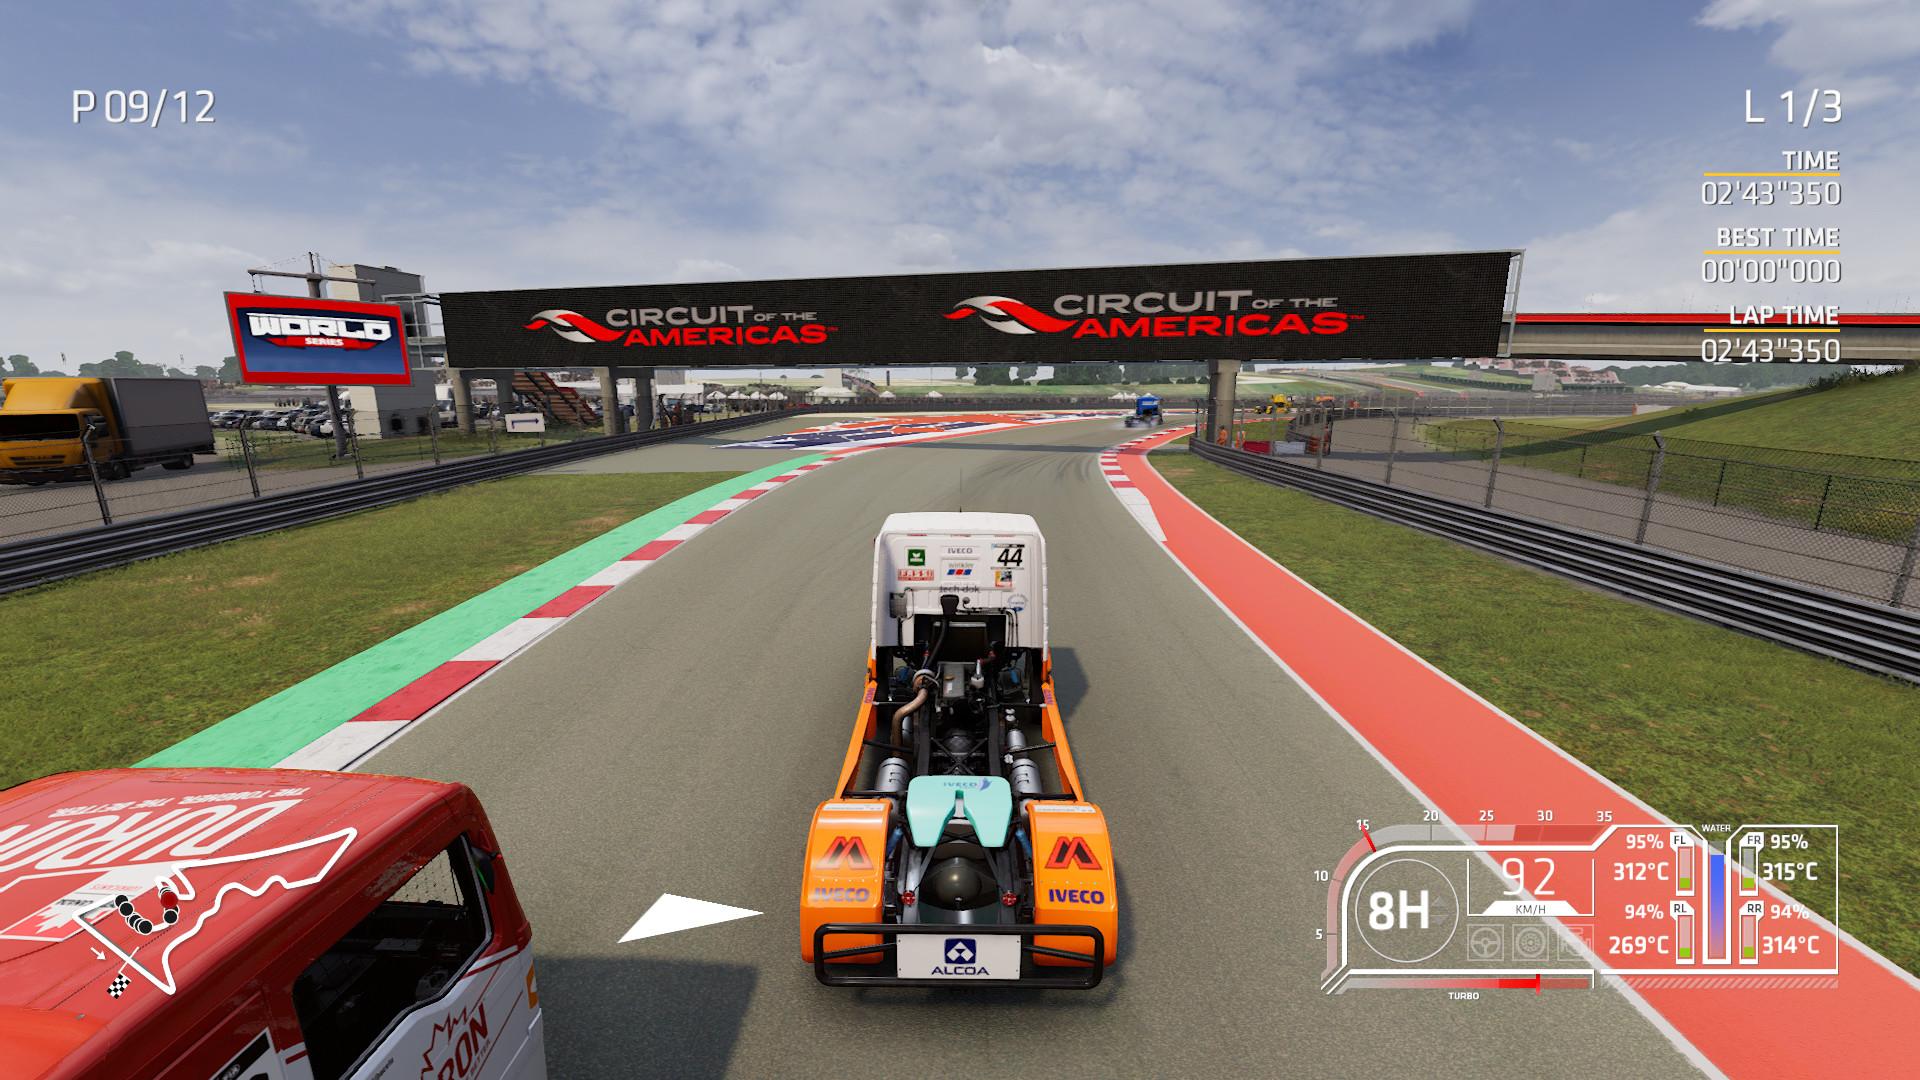 《FIA欧洲卡车锦标赛》Steam褒贬不一  卡车真的不好开